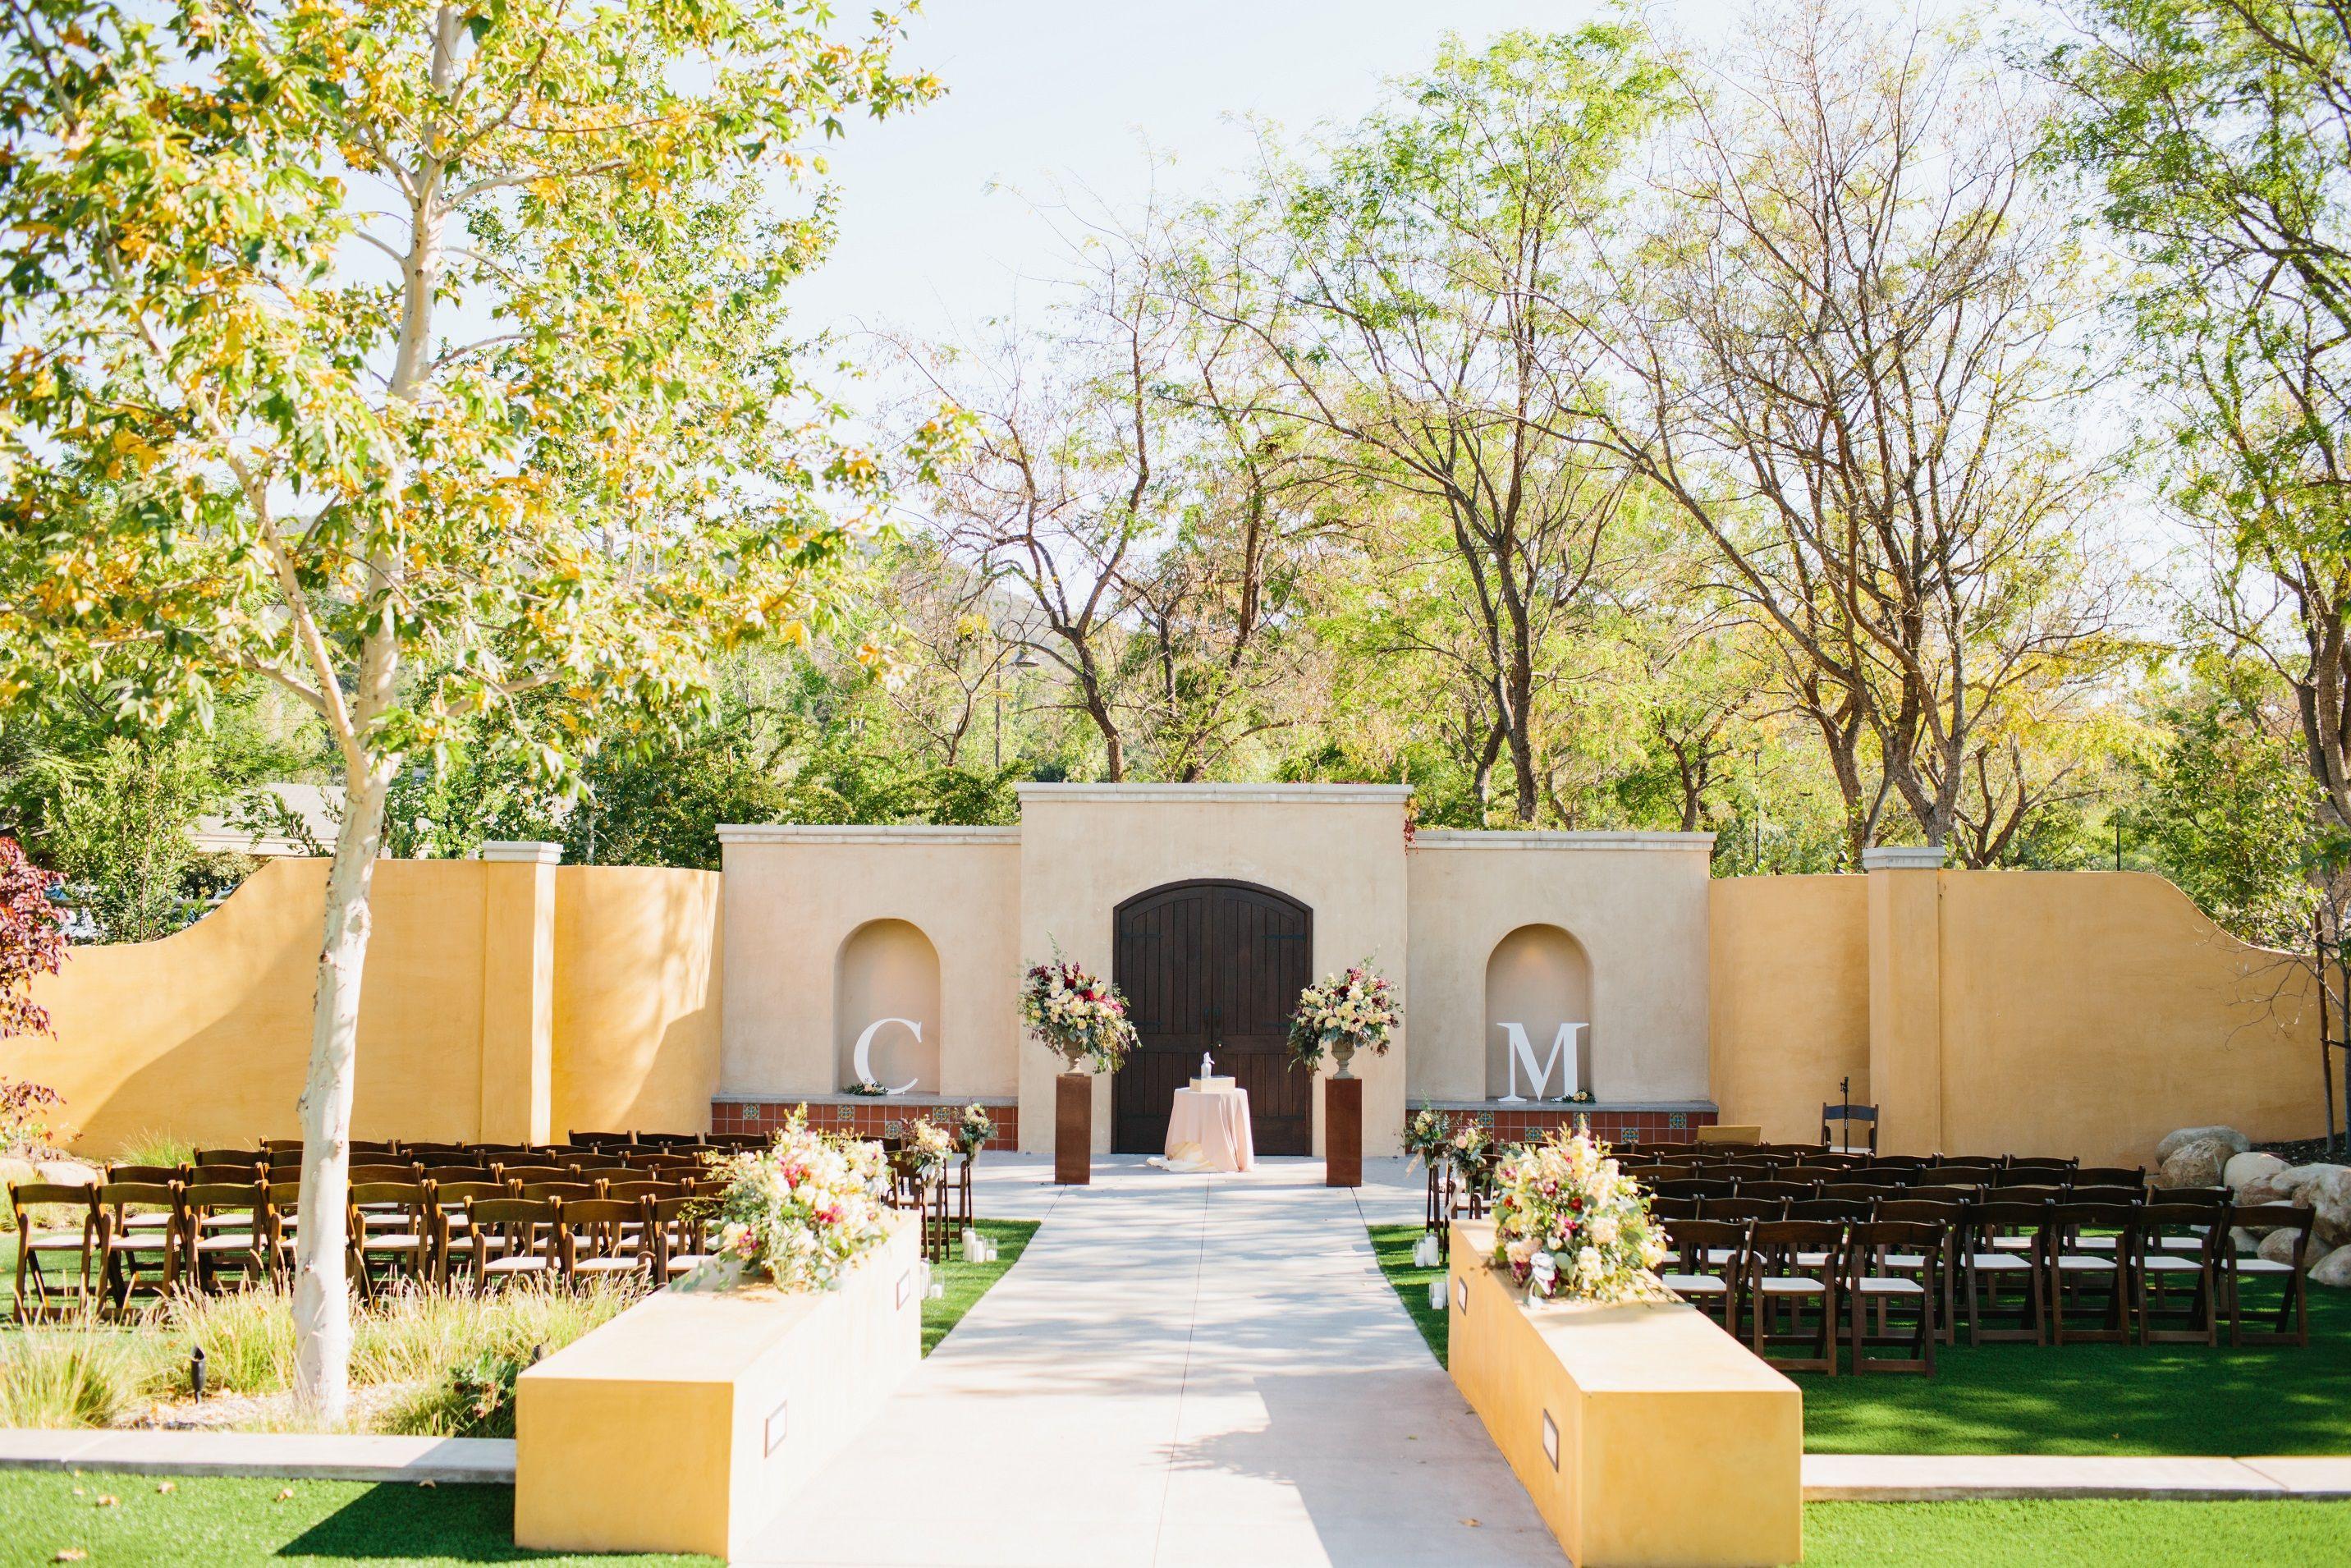 cde9548959716b0620c88f207bc1d939 - The Gardens At Los Robles Greens